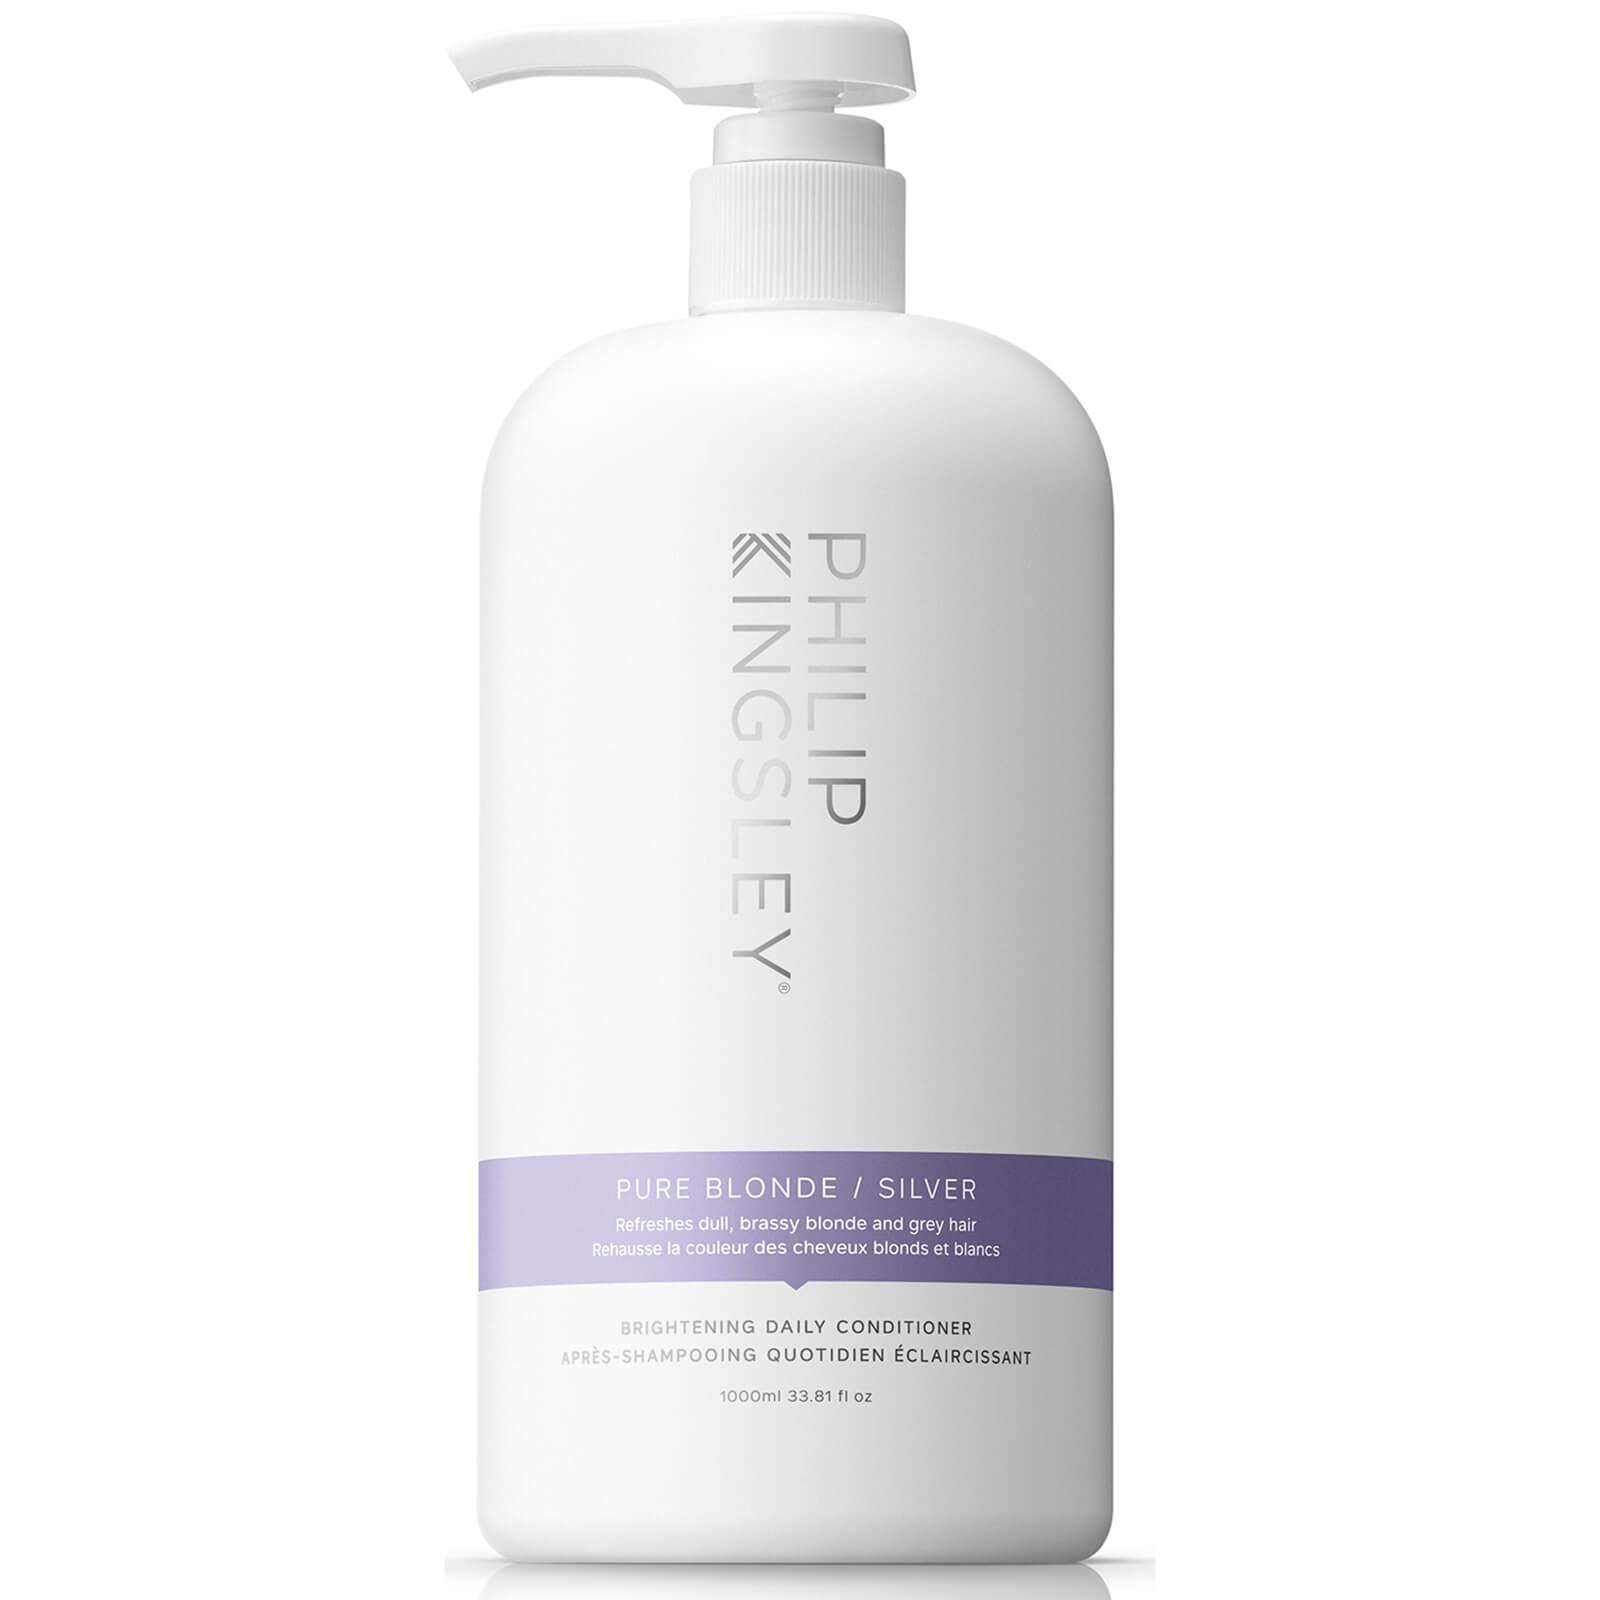 Philip Kingsley Pure Silver après-shampooing cheveux gris (1000ml)